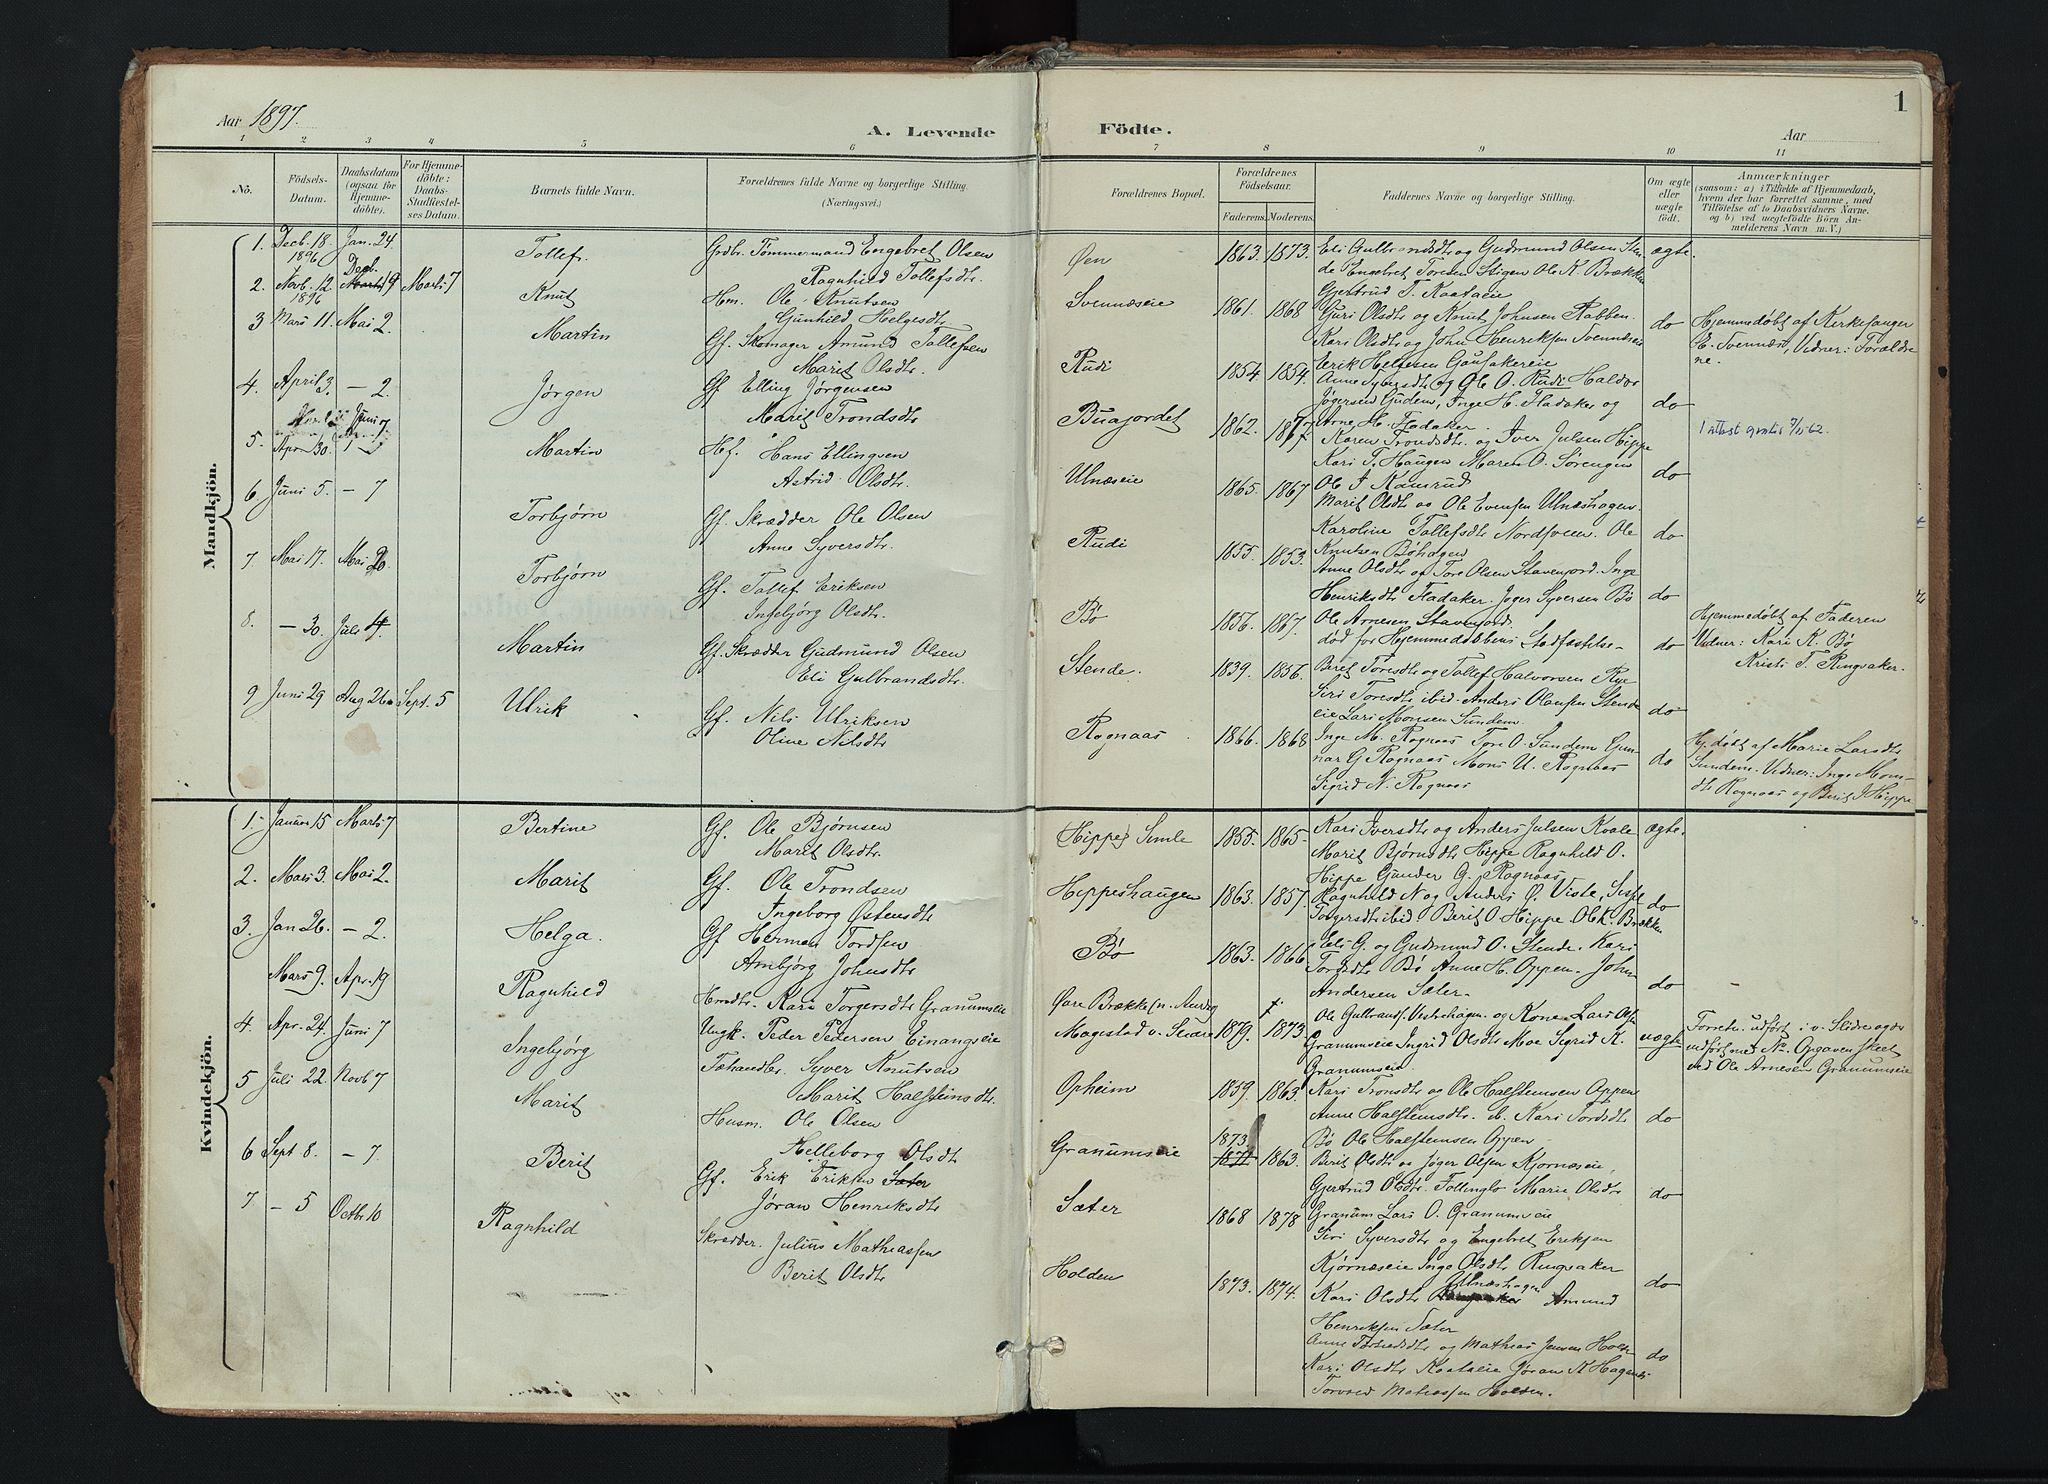 SAH, Nord-Aurdal prestekontor, Ministerialbok nr. 17, 1897-1926, s. 1